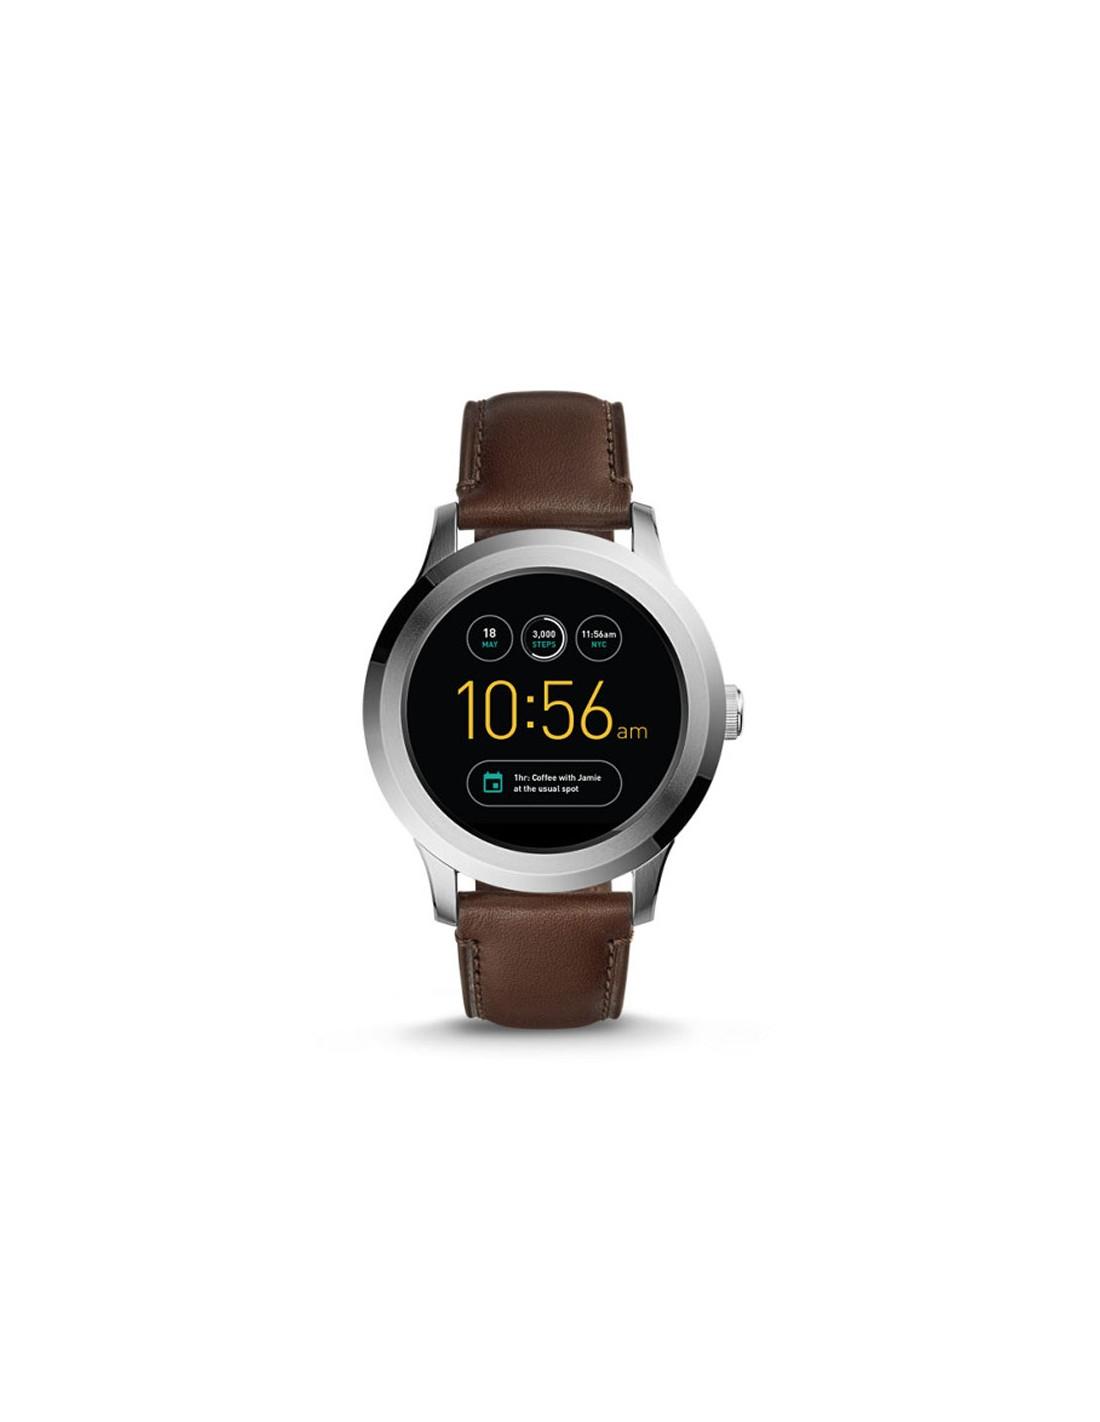 5a2d8897aa8f Reloj Fossil Smartwatch - Q Founder Dark Brown FTW2119